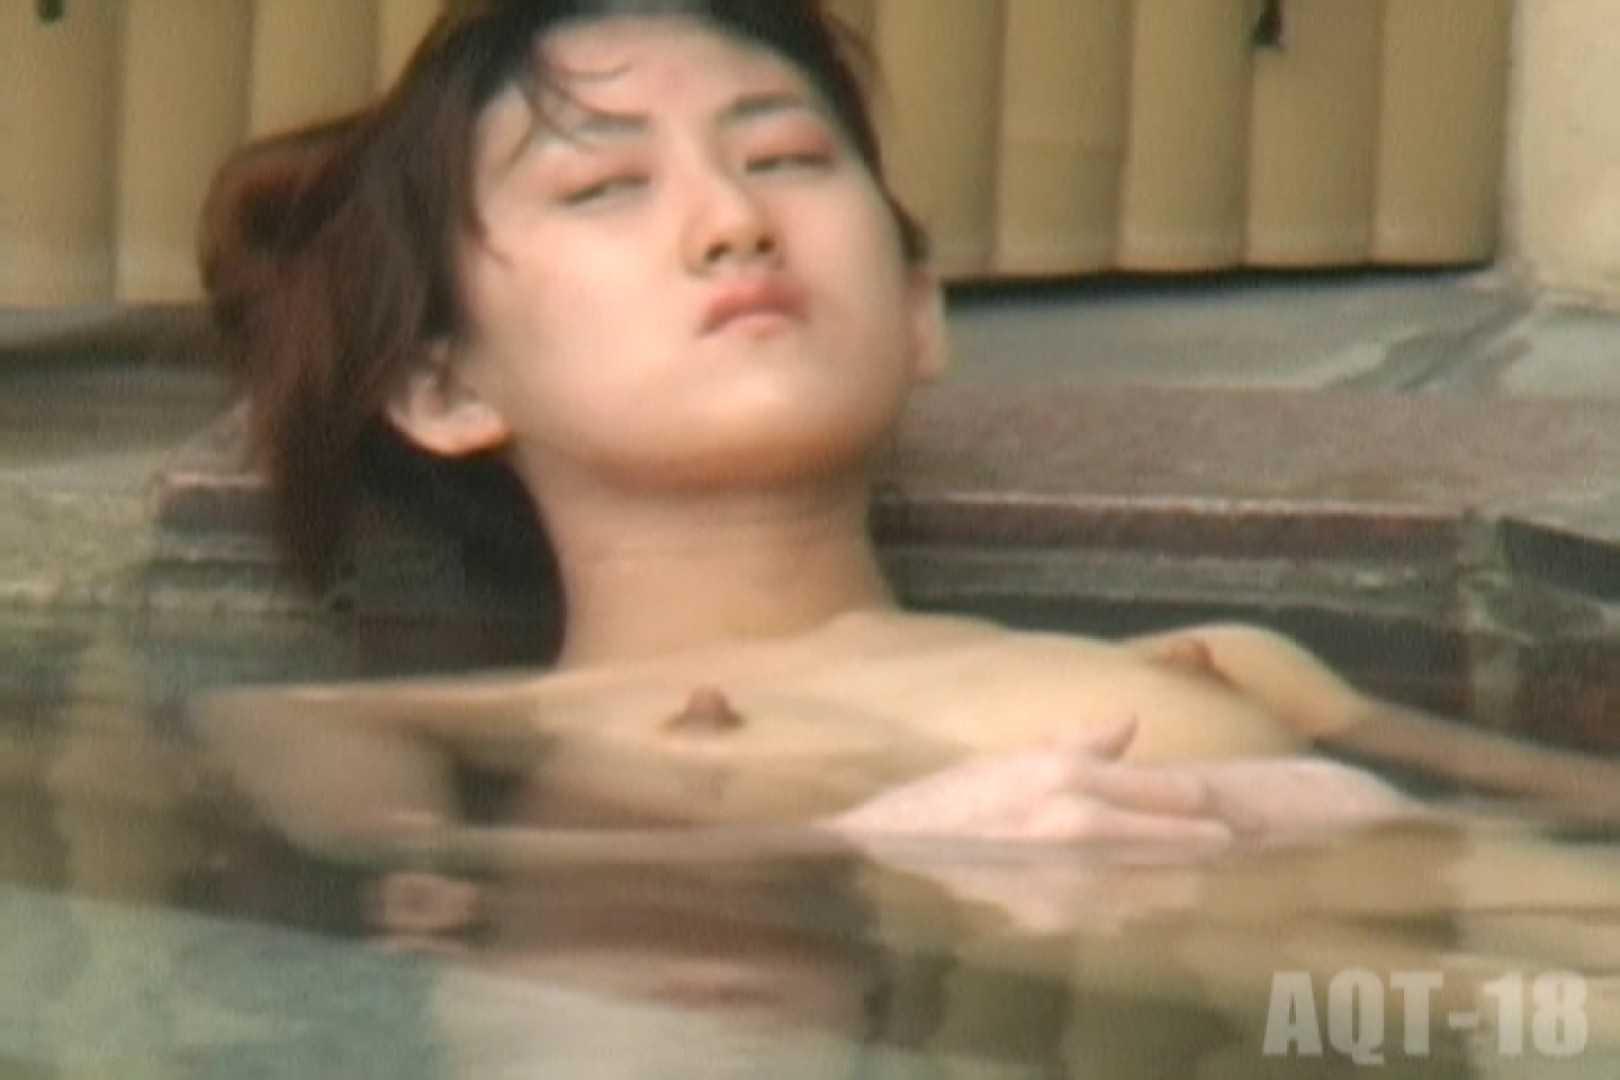 Aquaな露天風呂Vol.862 美しいOLの裸体 戯れ無修正画像 99pic 50